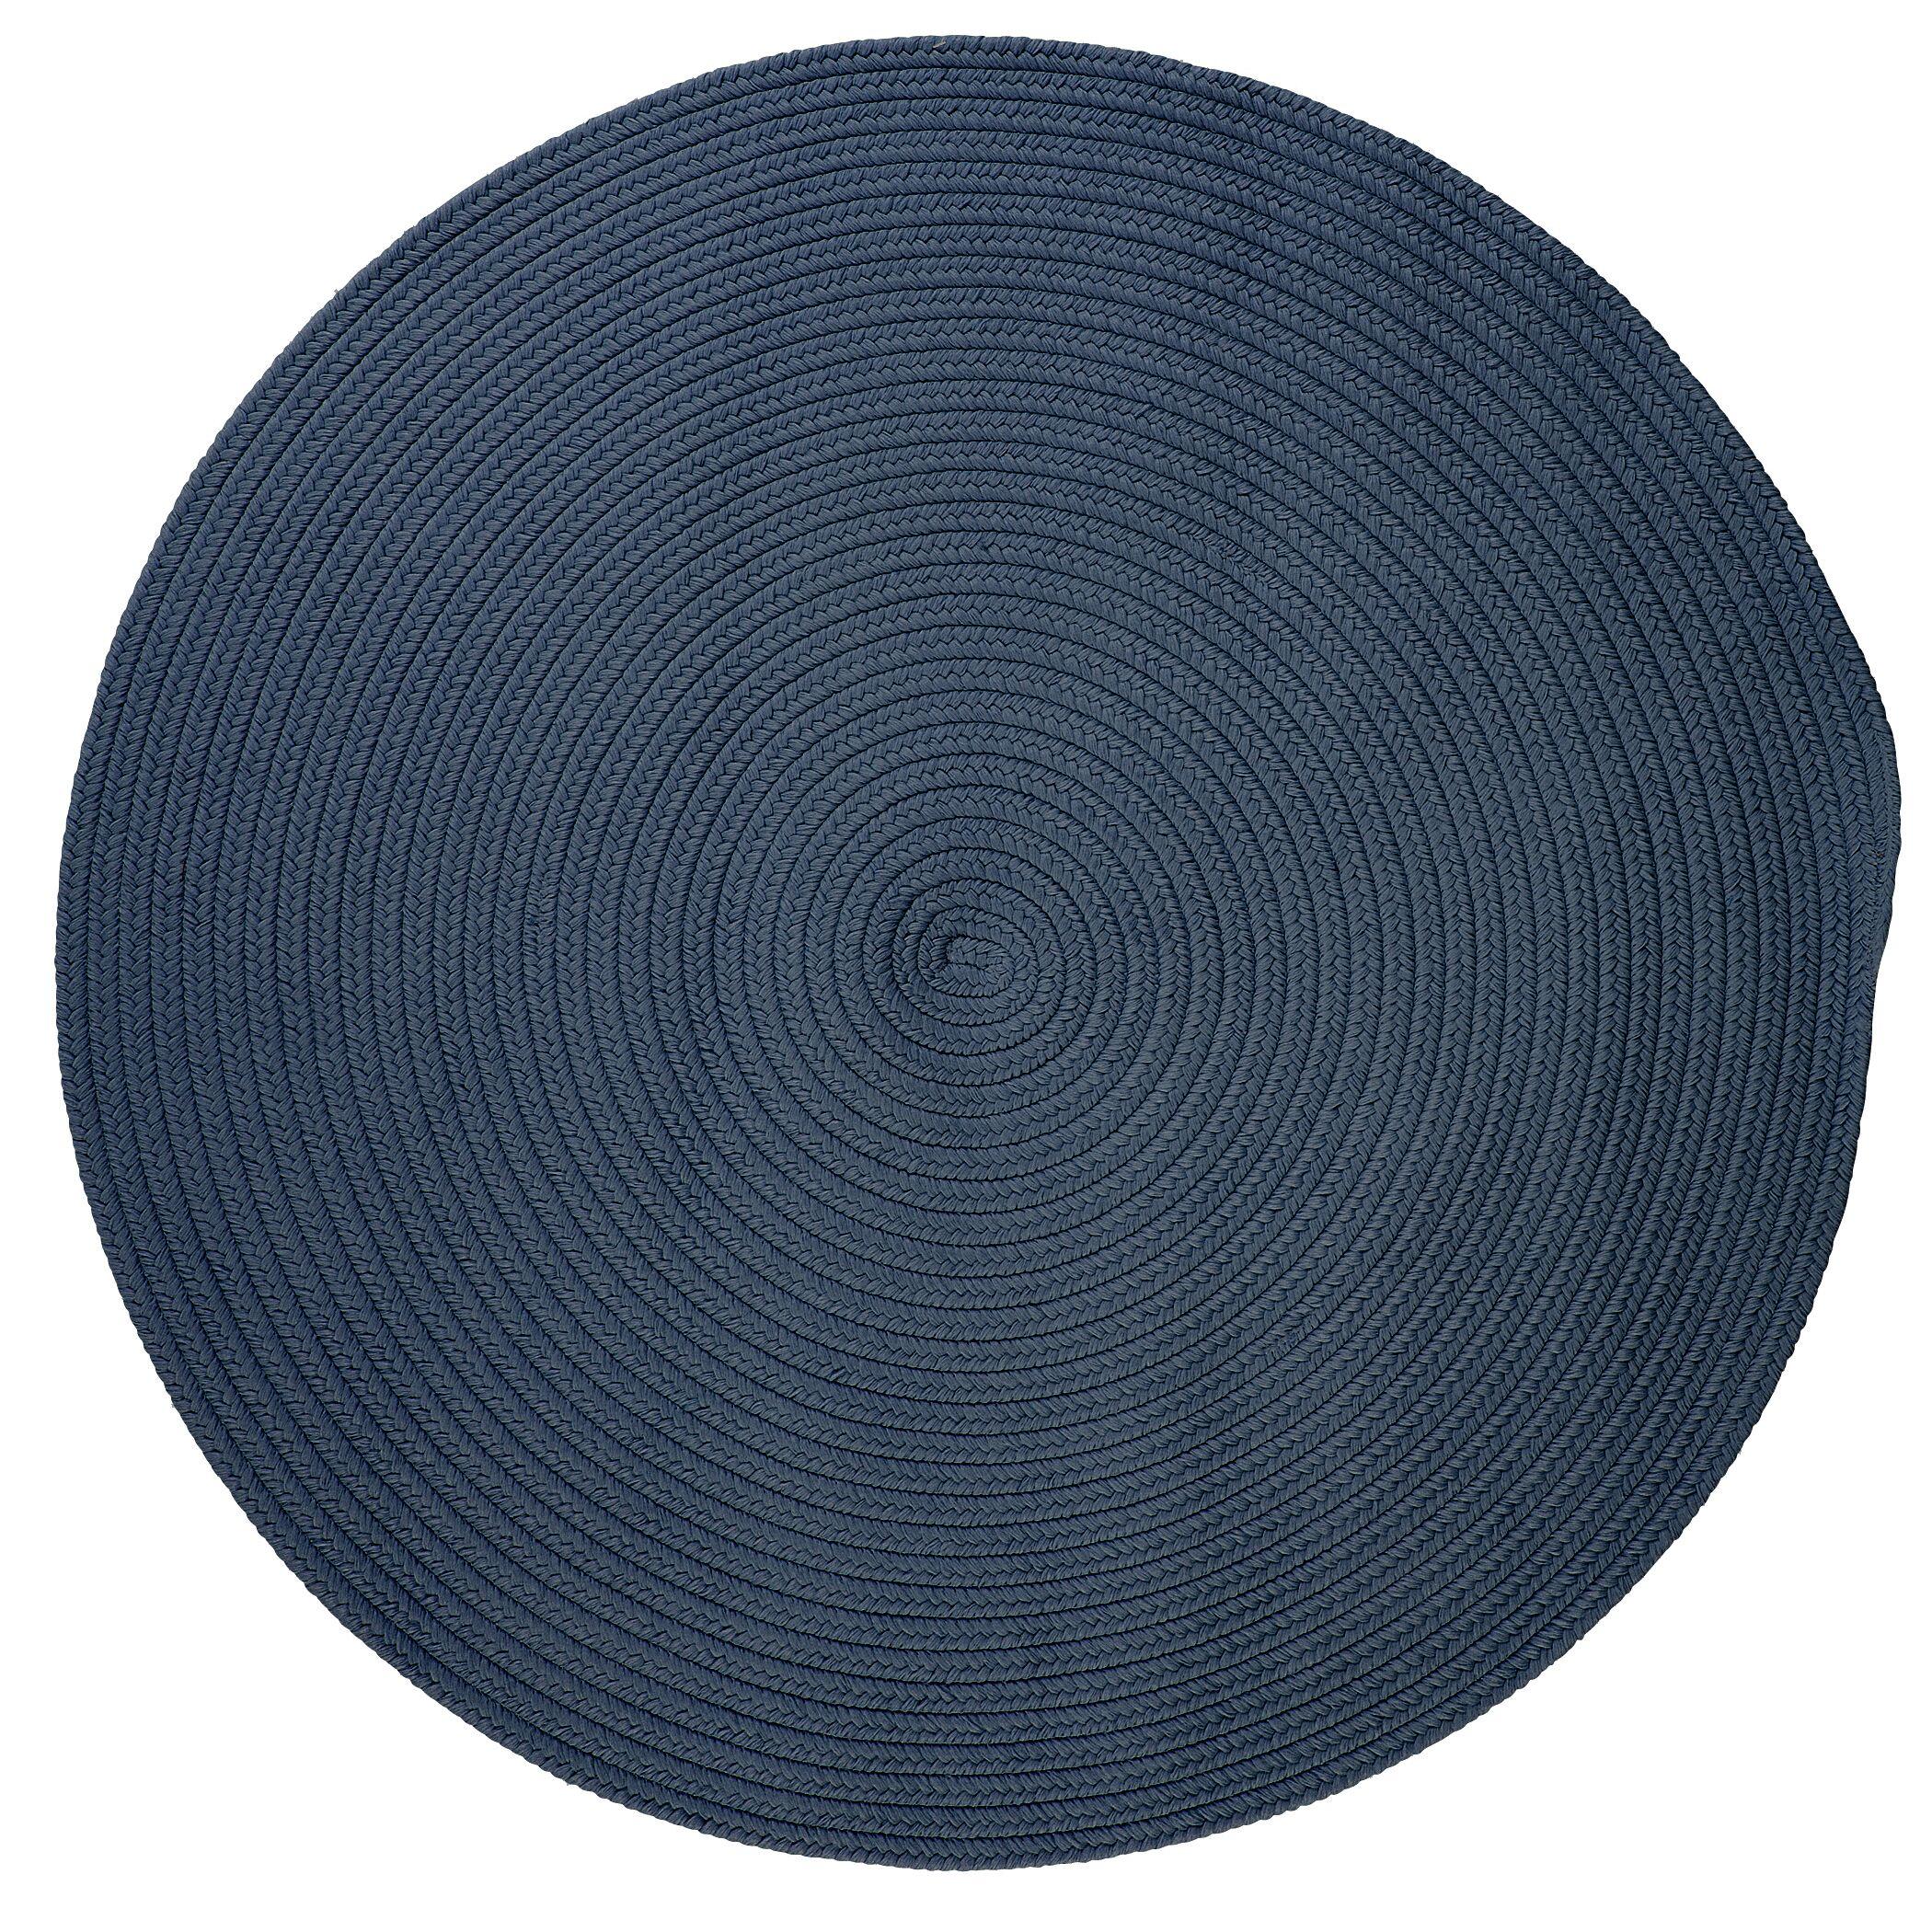 Mcintyre Blue Indoor/Outdoor Area Rug Rug Size: Round 4'